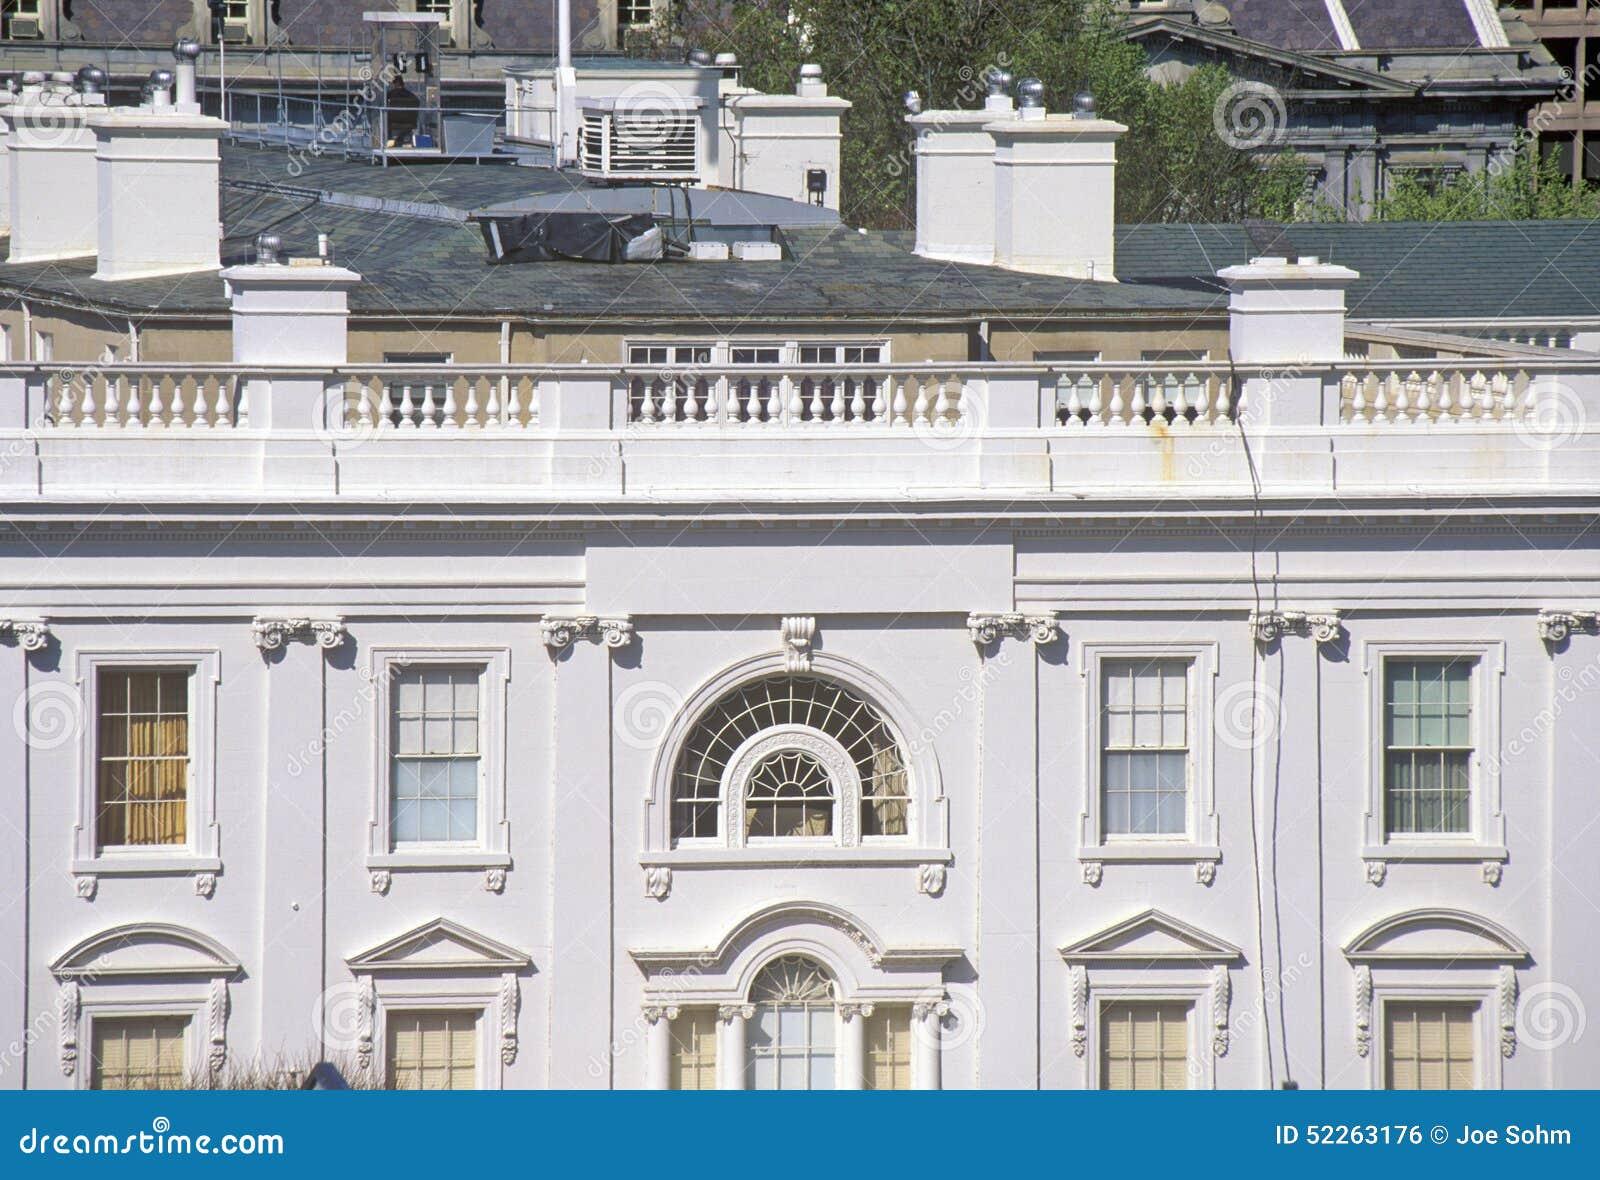 White House, a view of private quarters, Washington, DC